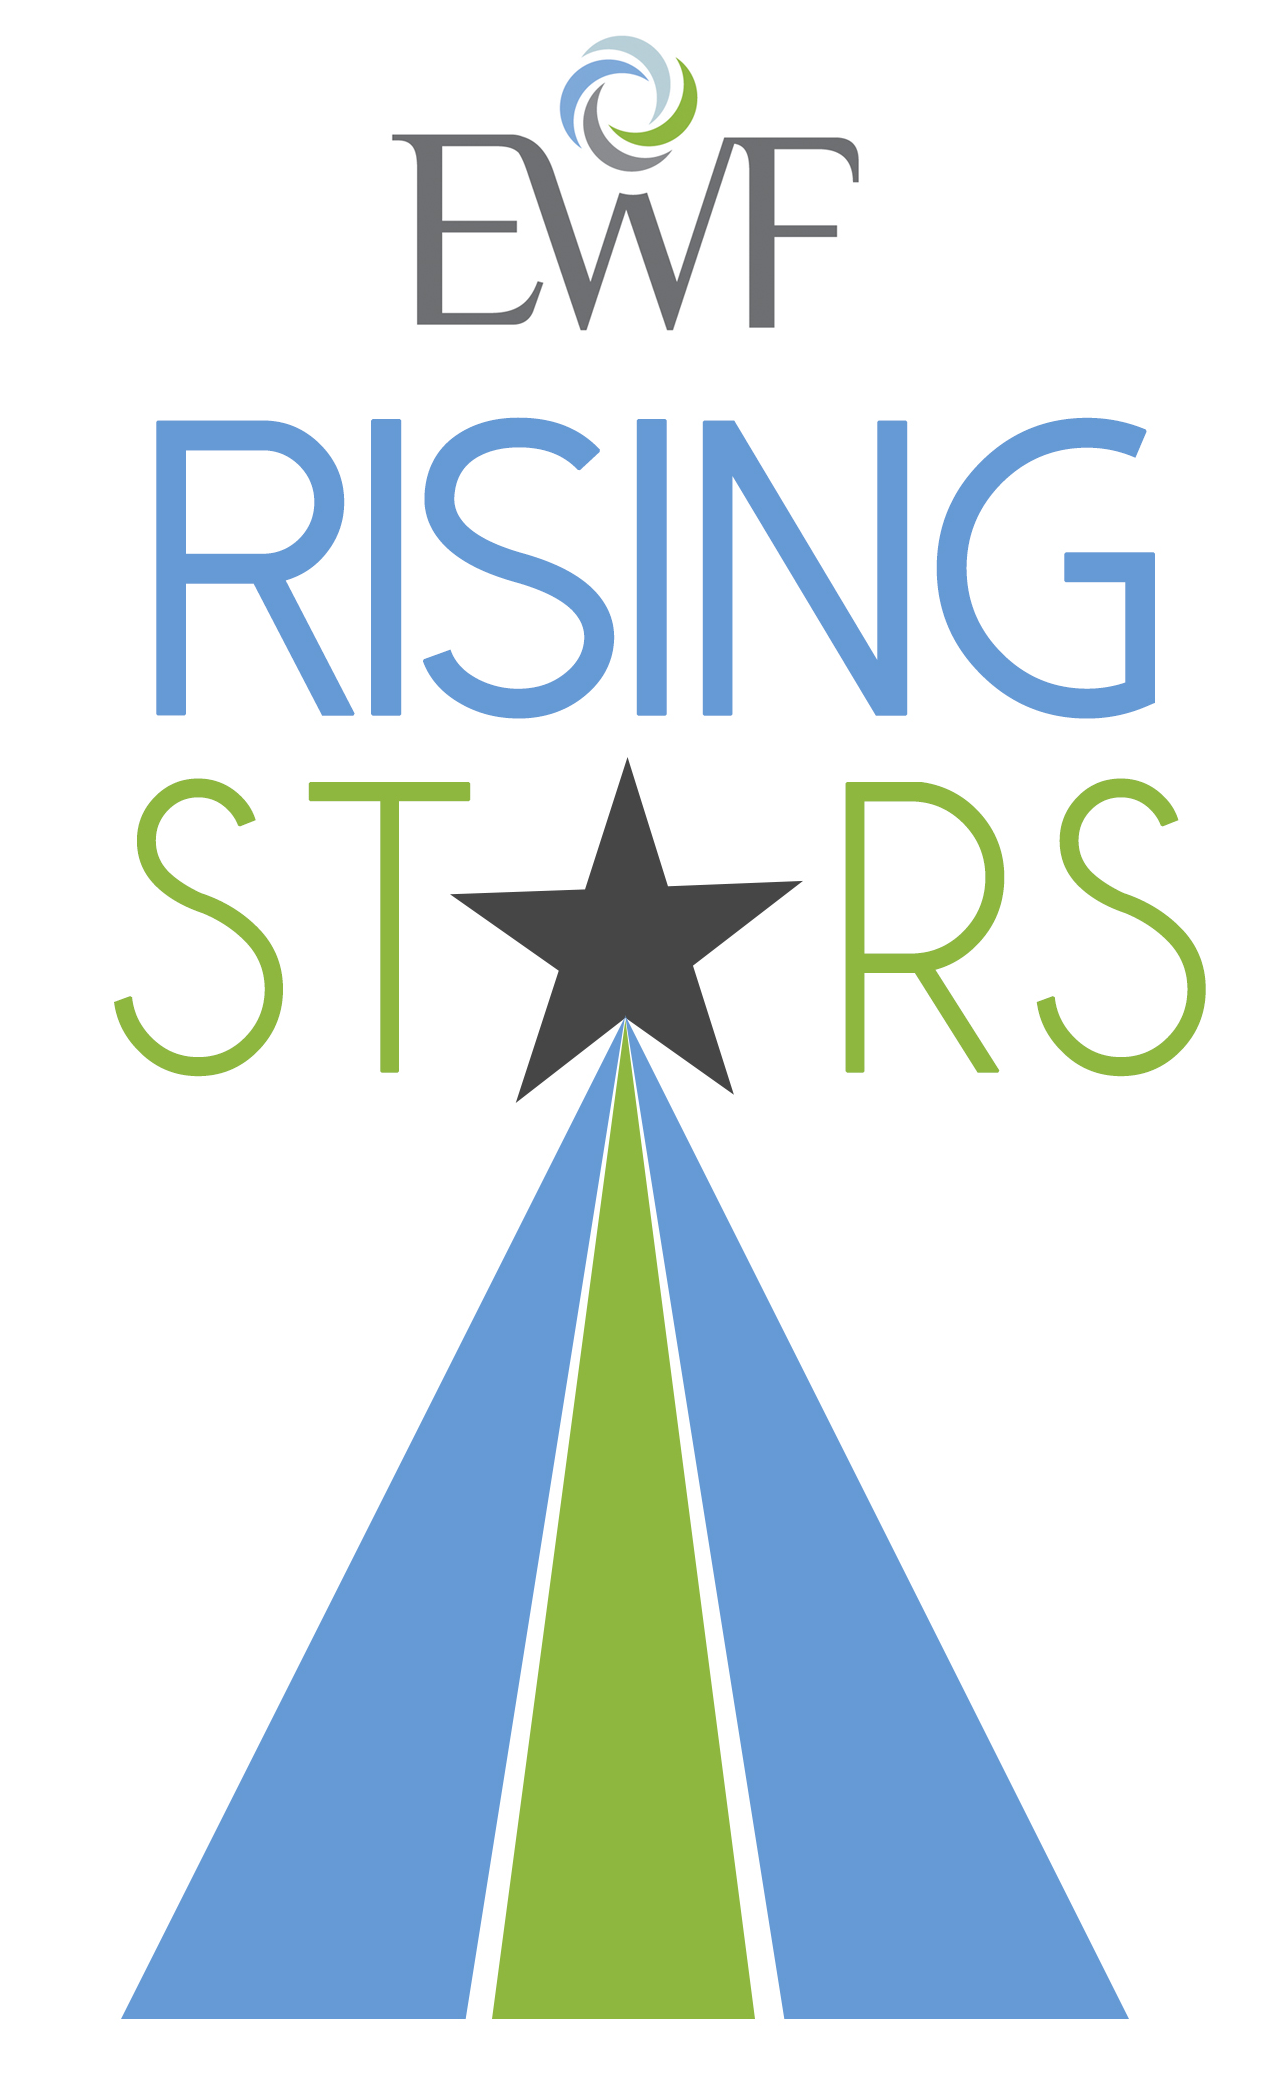 EWF Rising Stars